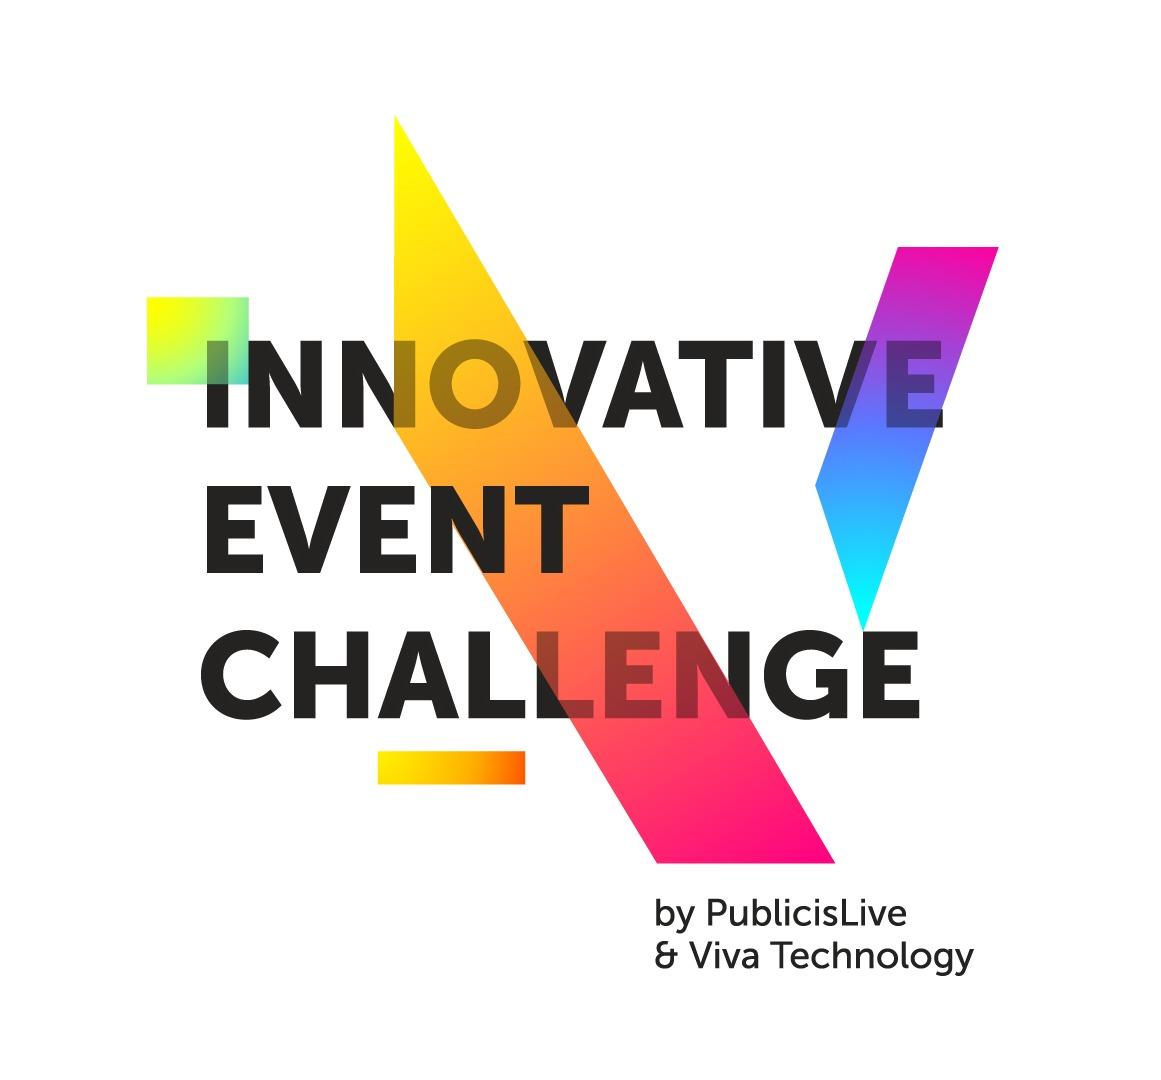 Innovative Event Challenge